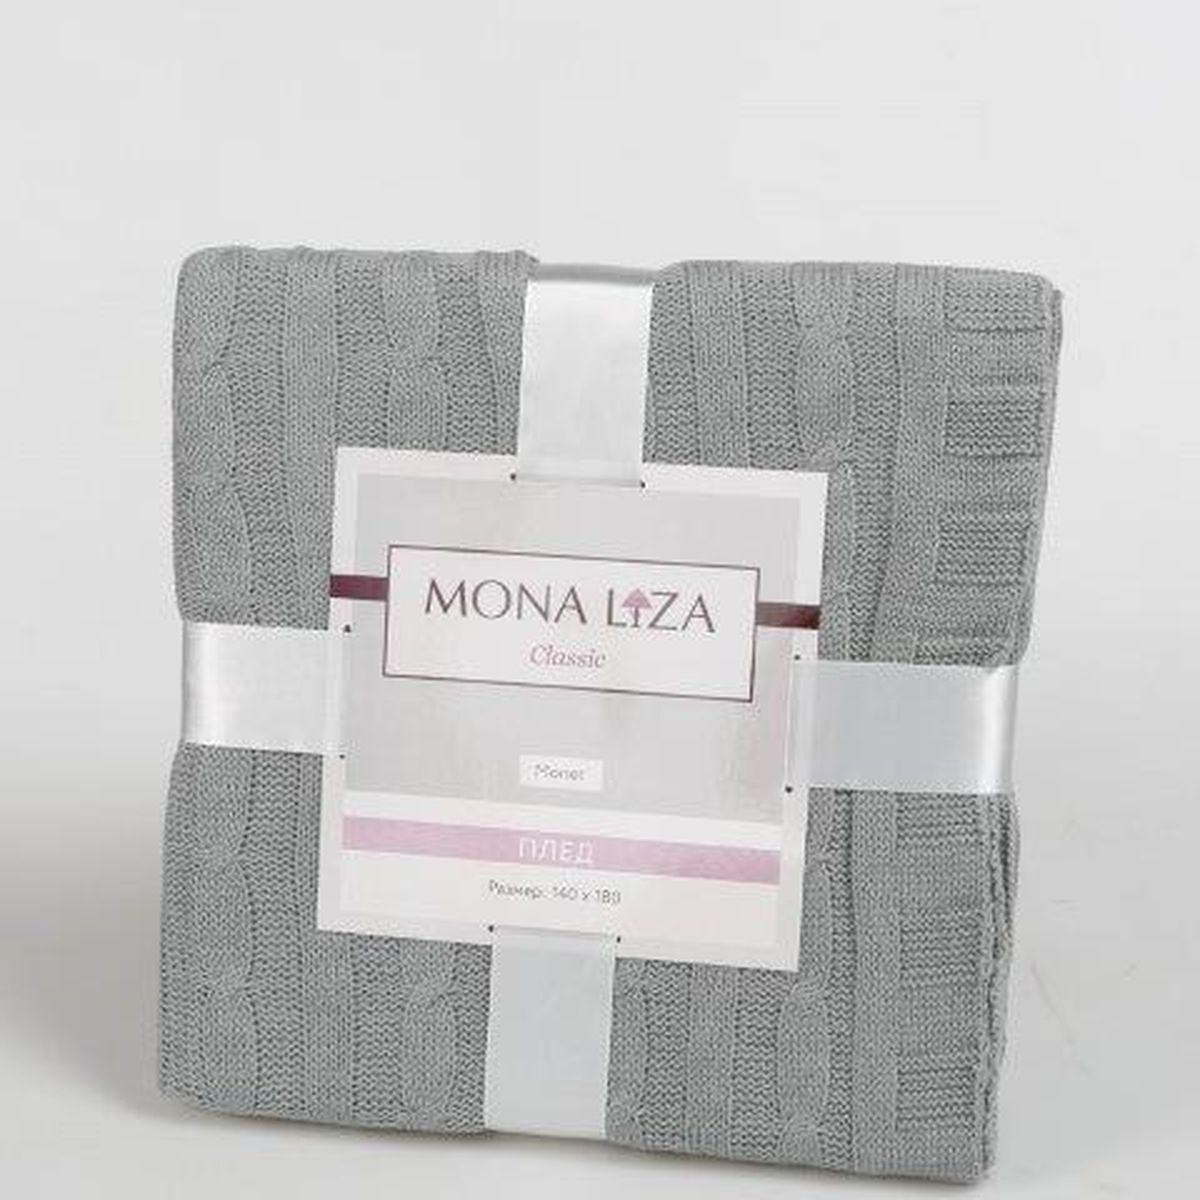 Плед Mona Liza Classic Monet, цвет: серый, 140 х 180 см